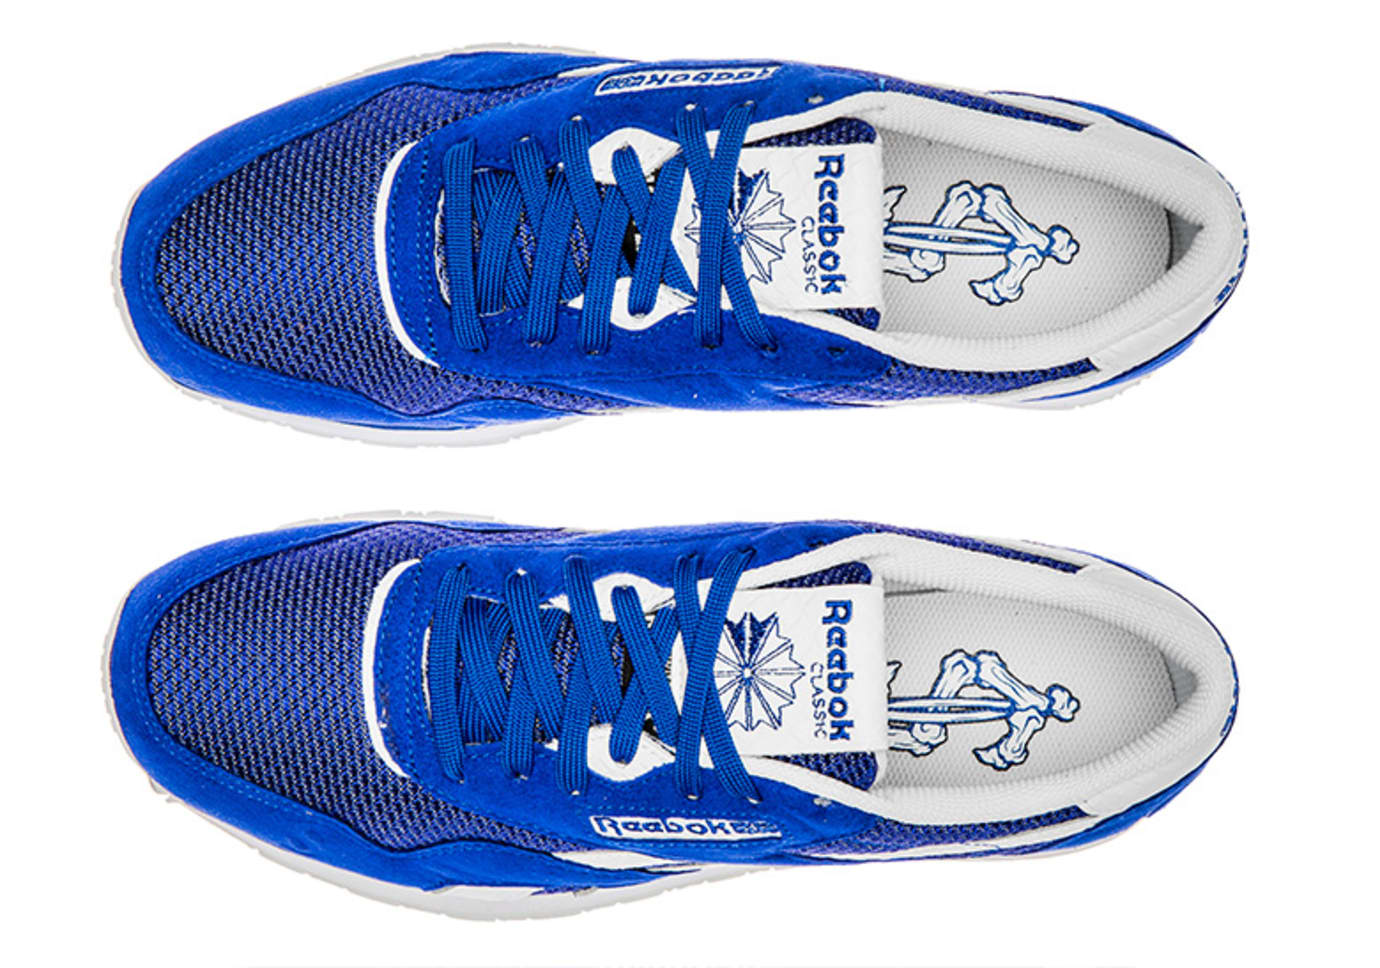 20e153bd90a9 Image via Sneaker News Reebok Classic Nylon CN4521 (Top)